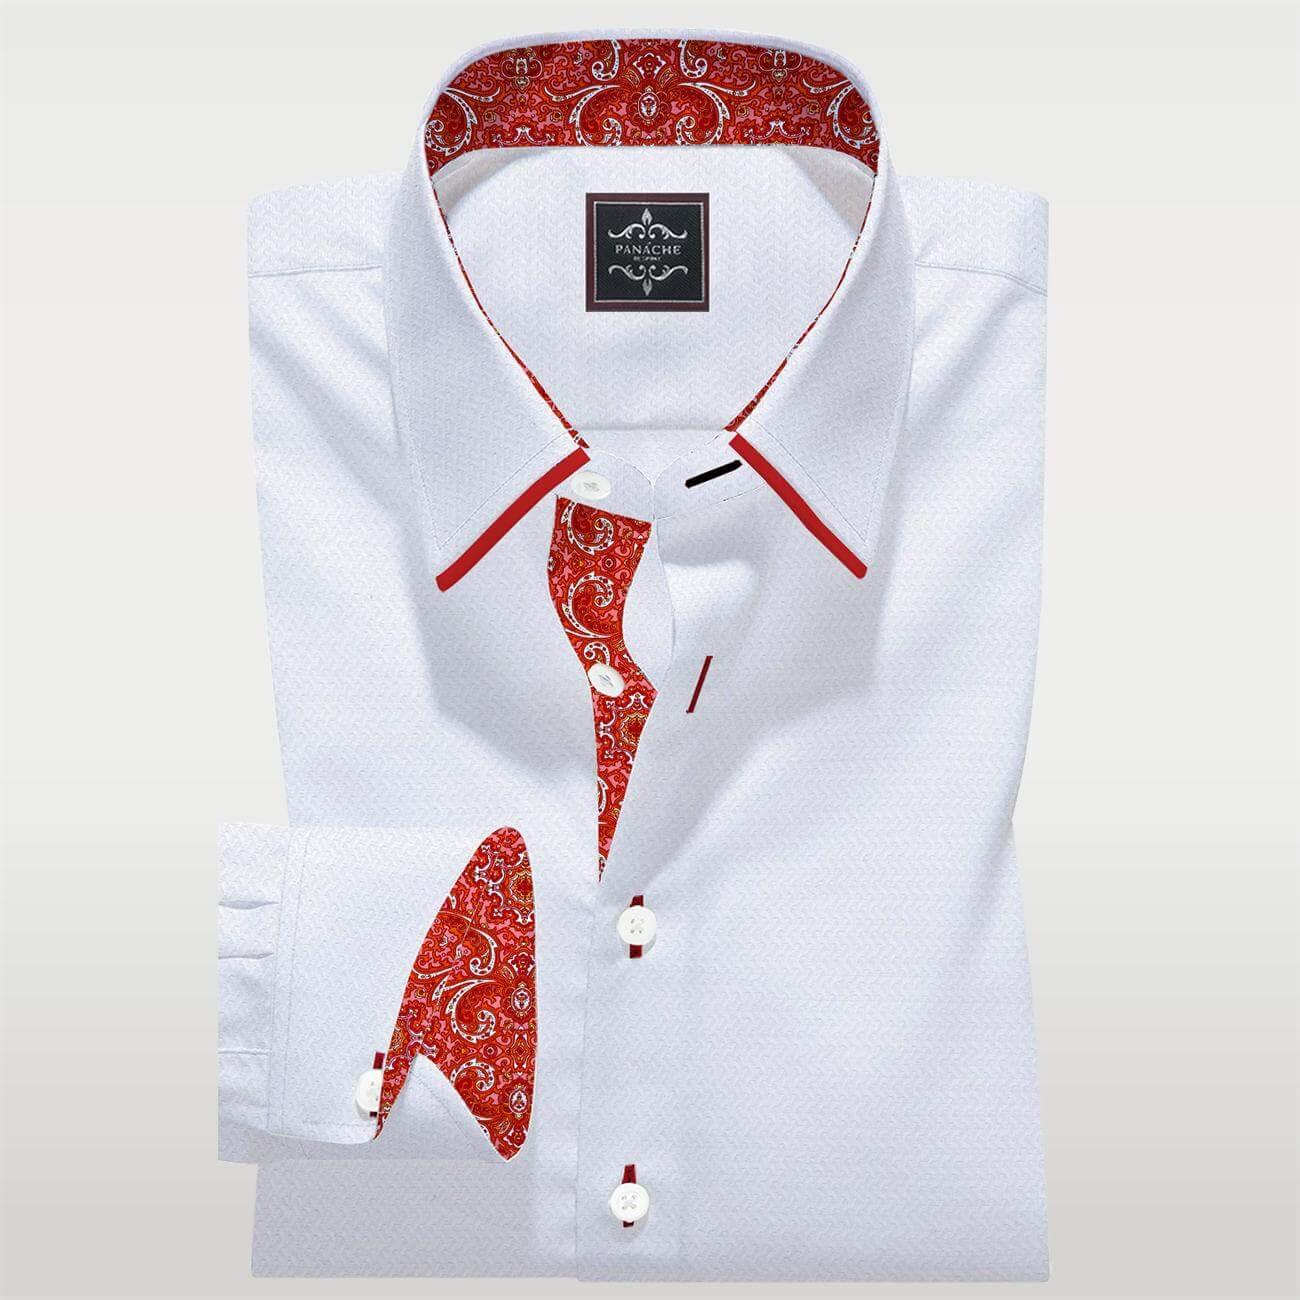 Luxury White Double Collar Shirt